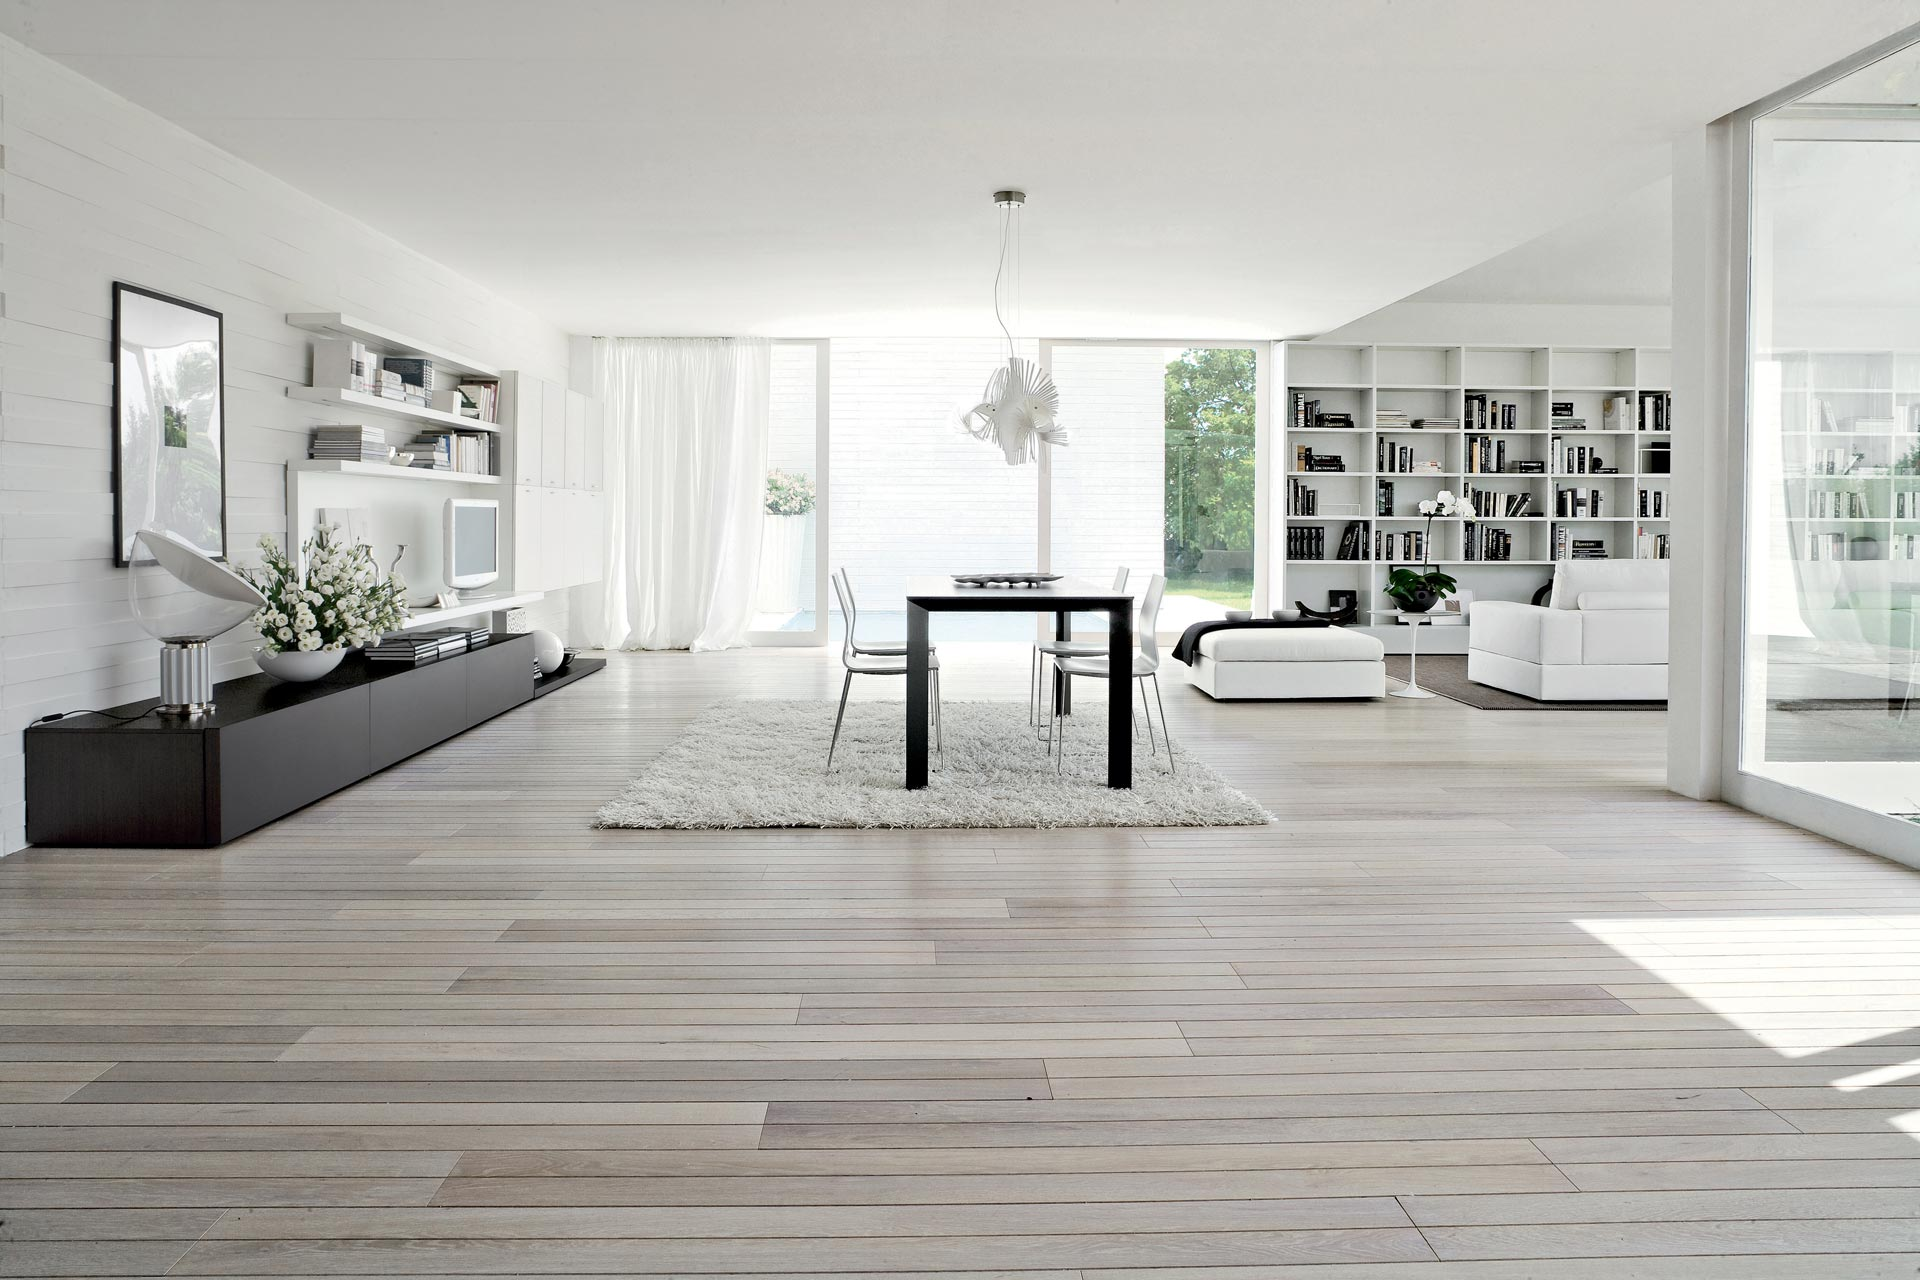 Мебель в стиле минимализма